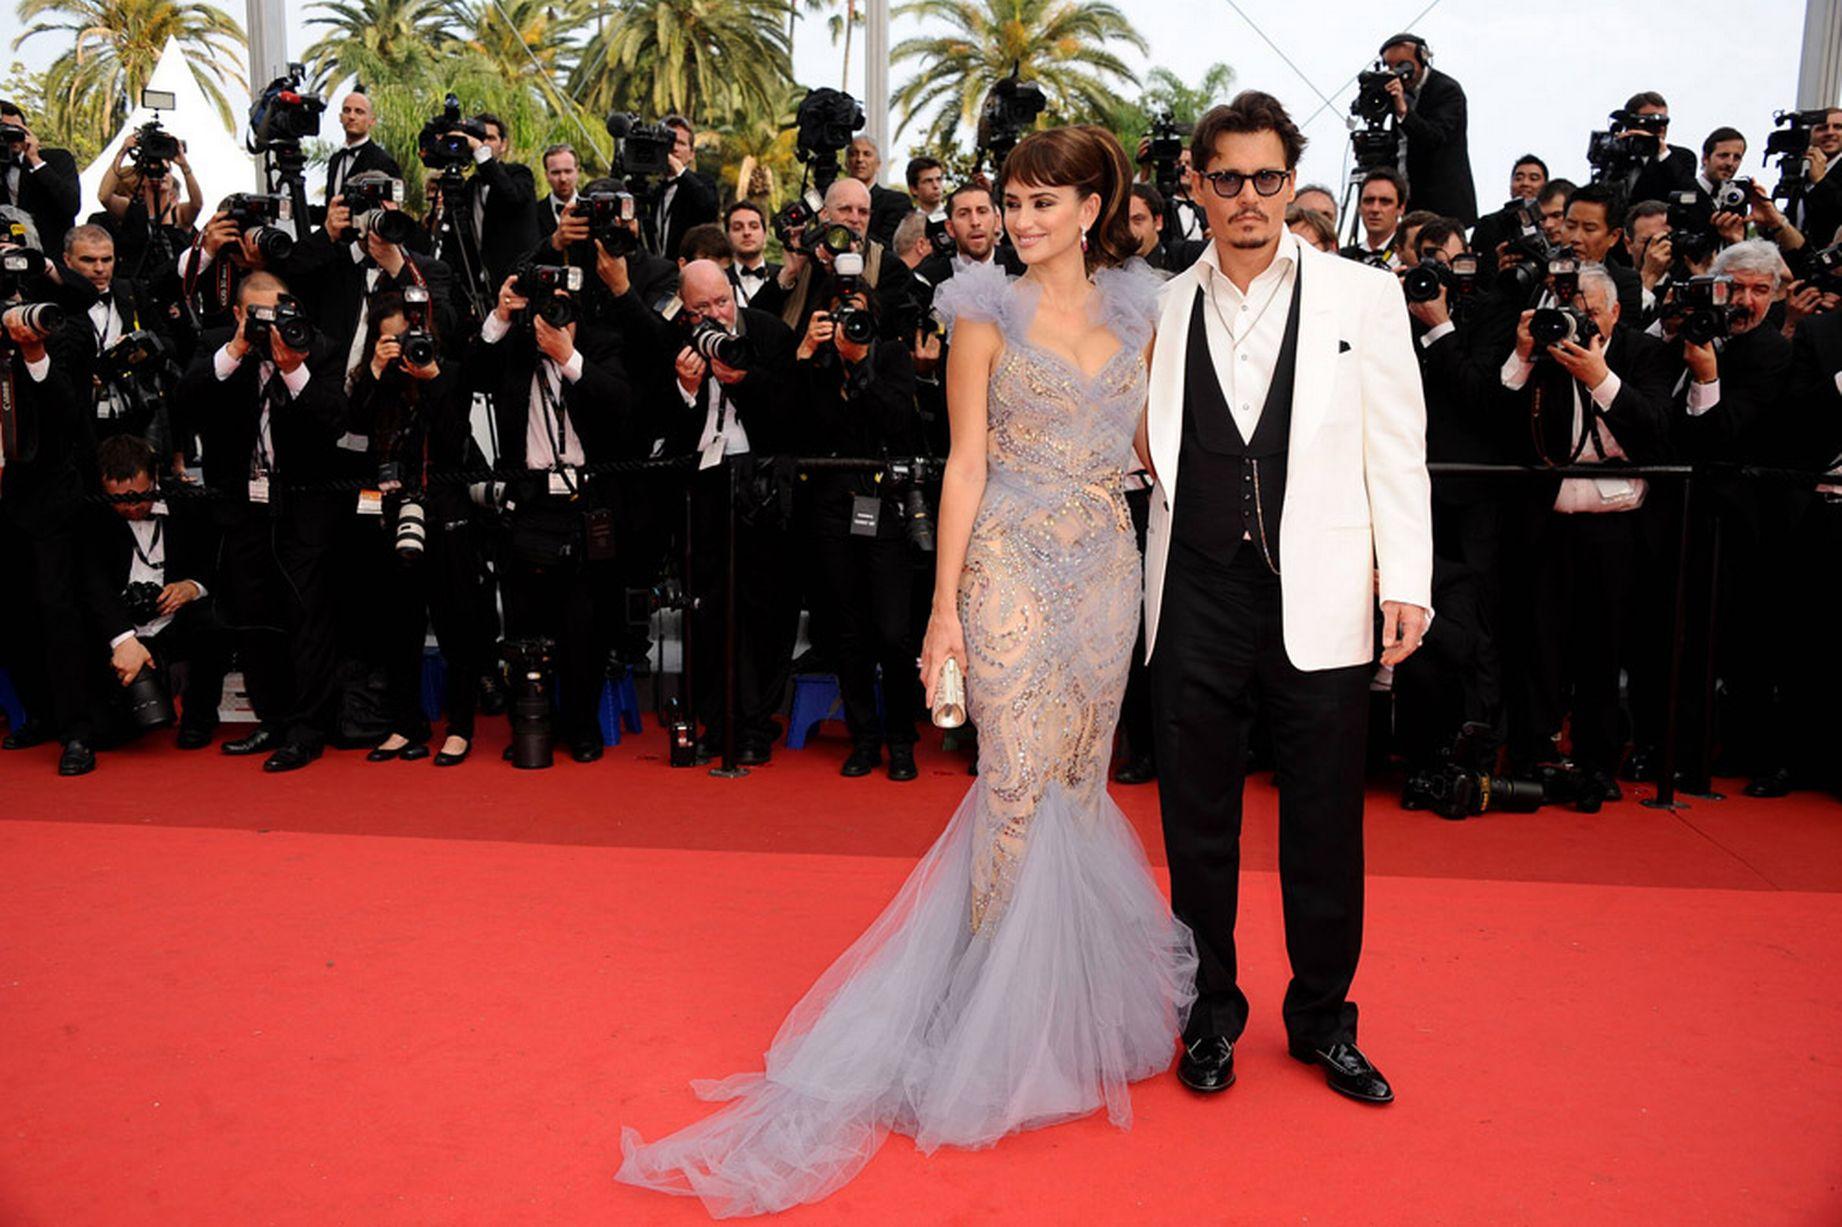 Penelope-Cruz-and-Johnny-Depp-2011 (1)